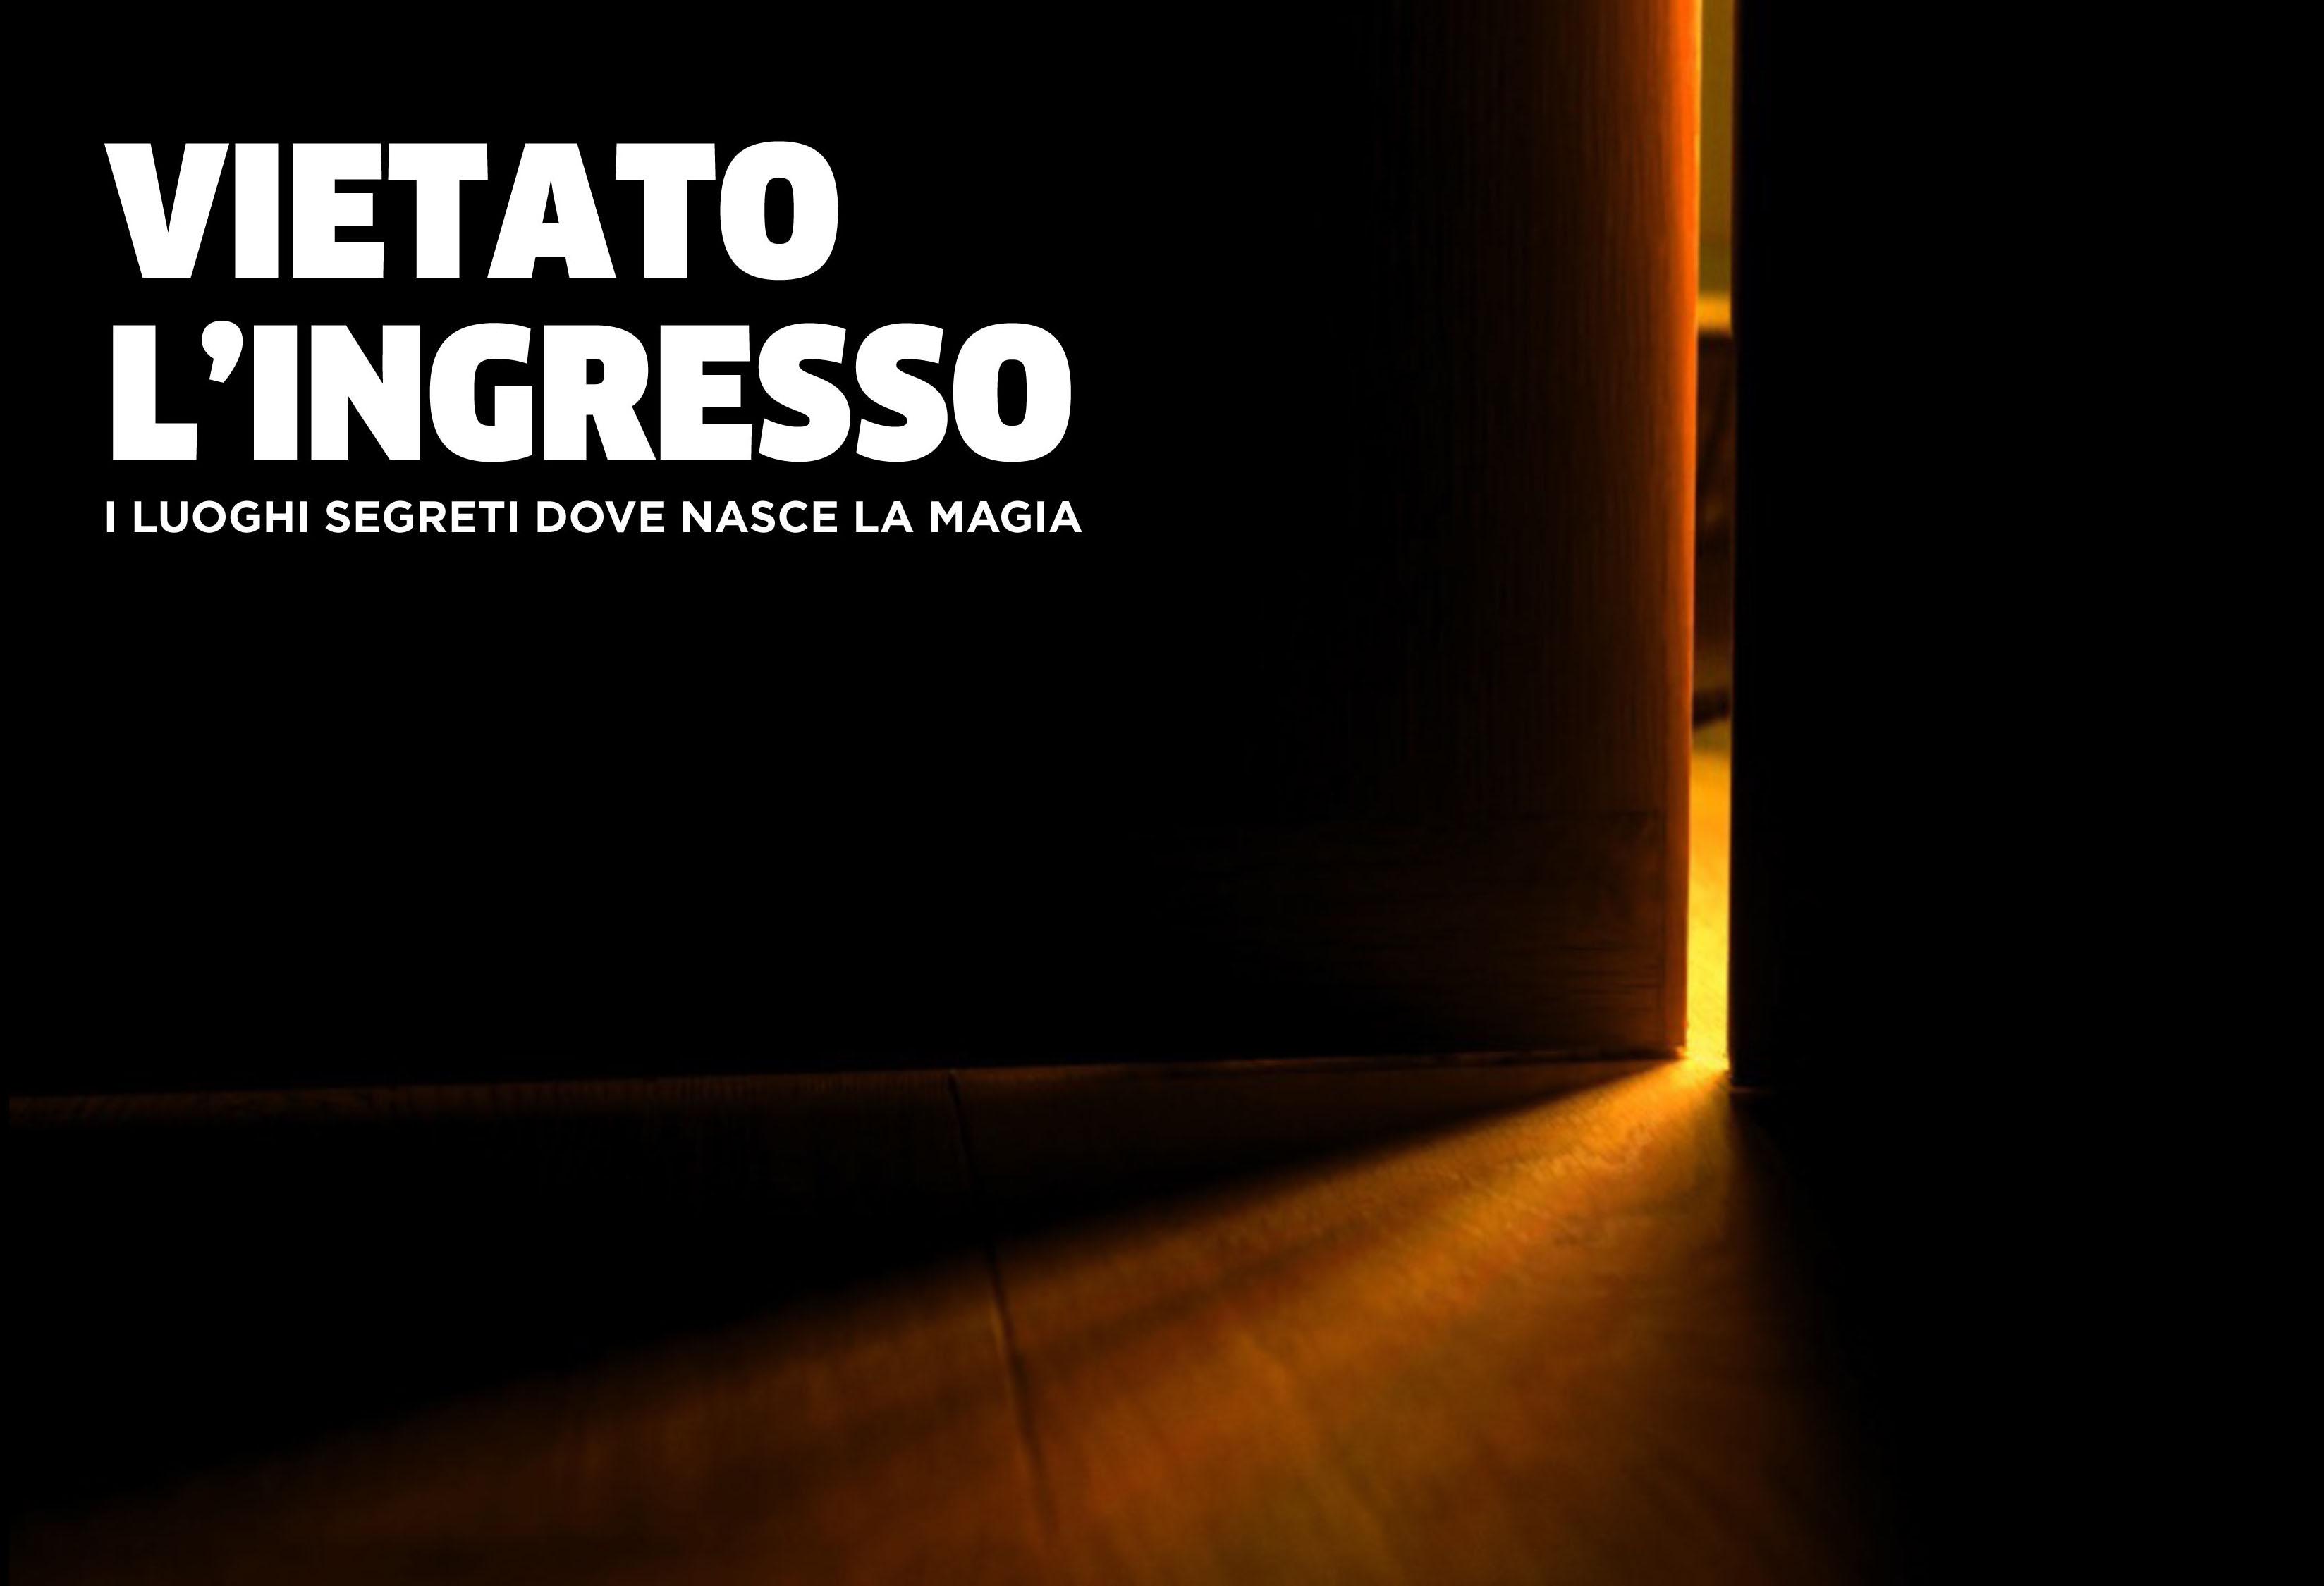 TEATRO ARCIMBOLDI - VIETATO L'INGRESSO I LUOGHI SEGRETI DOVE NASCE LA MAGIA